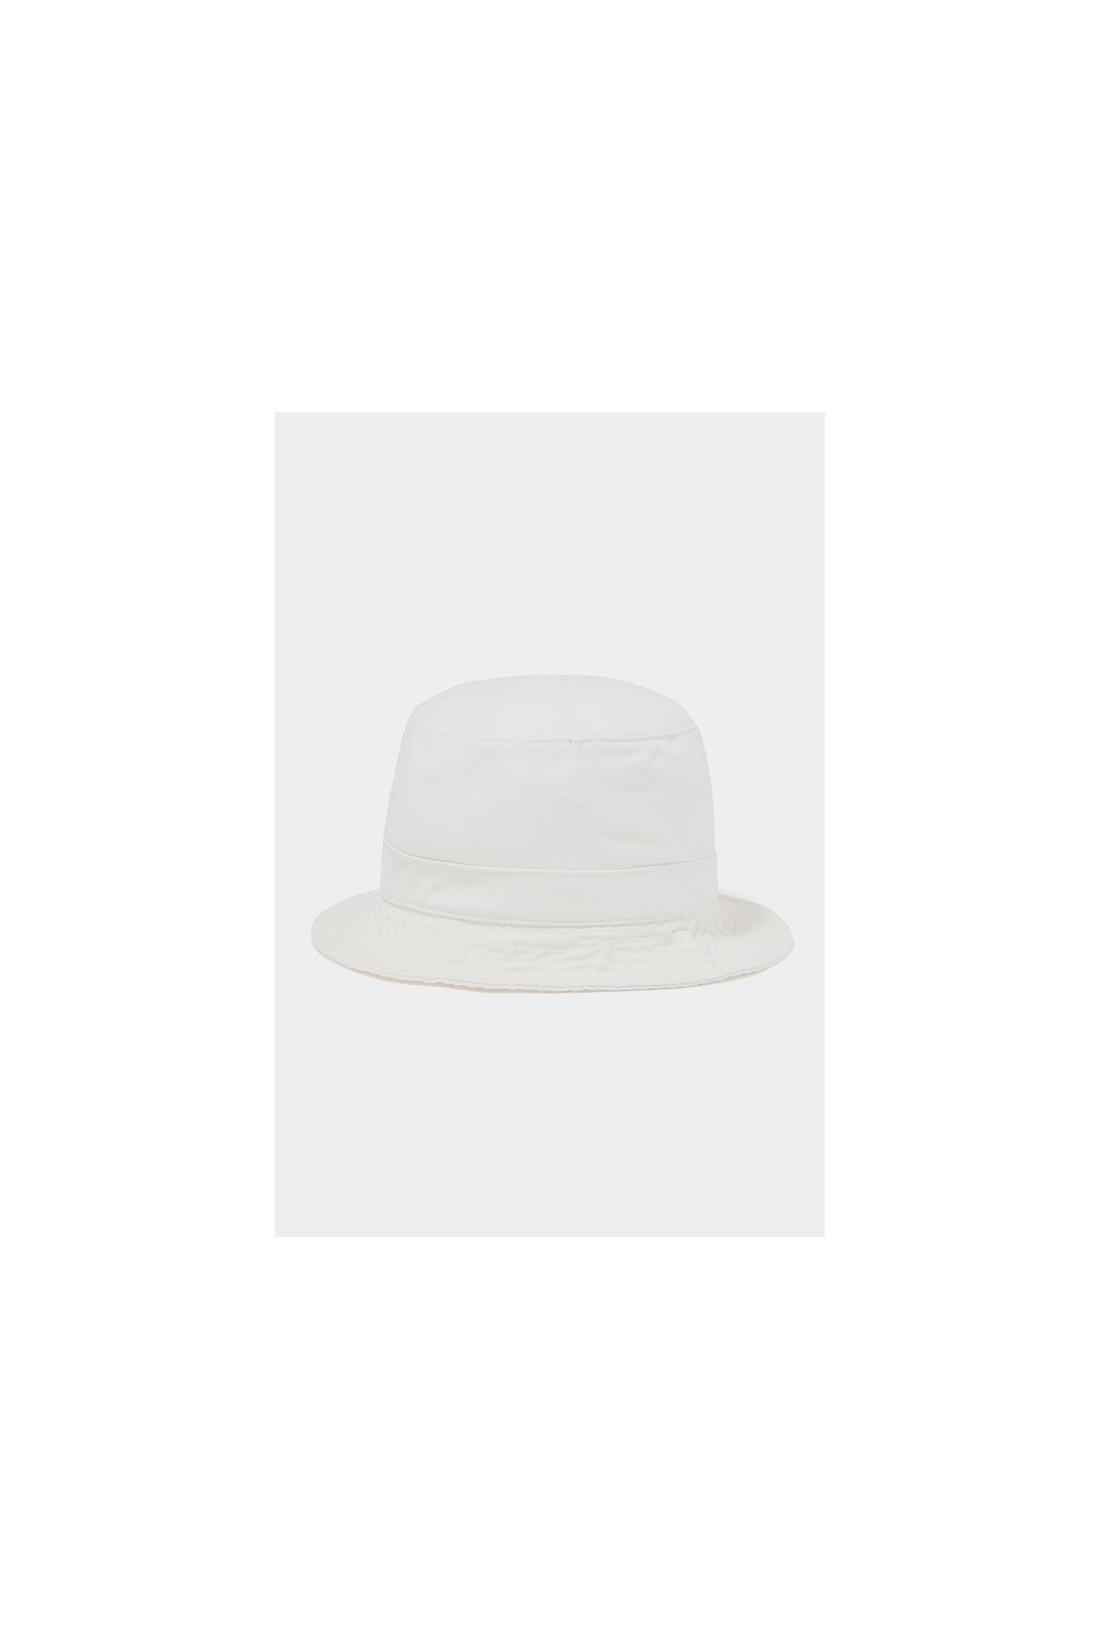 POLO RALPH LAUREN / Loft bucket hat cotton chino Cream